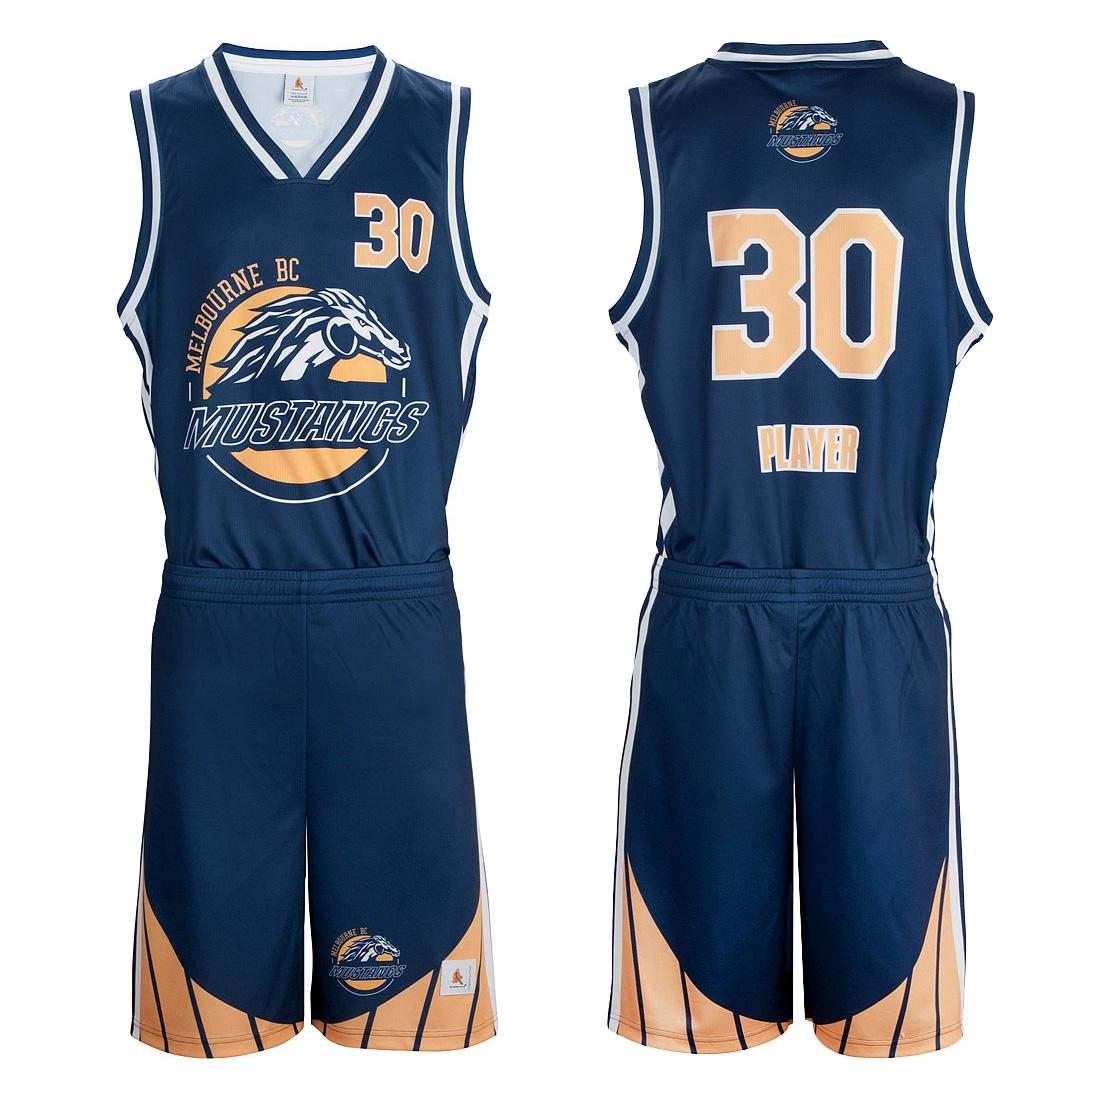 Custom Elite Sublimated Basketball Uniforms from Slamstyle